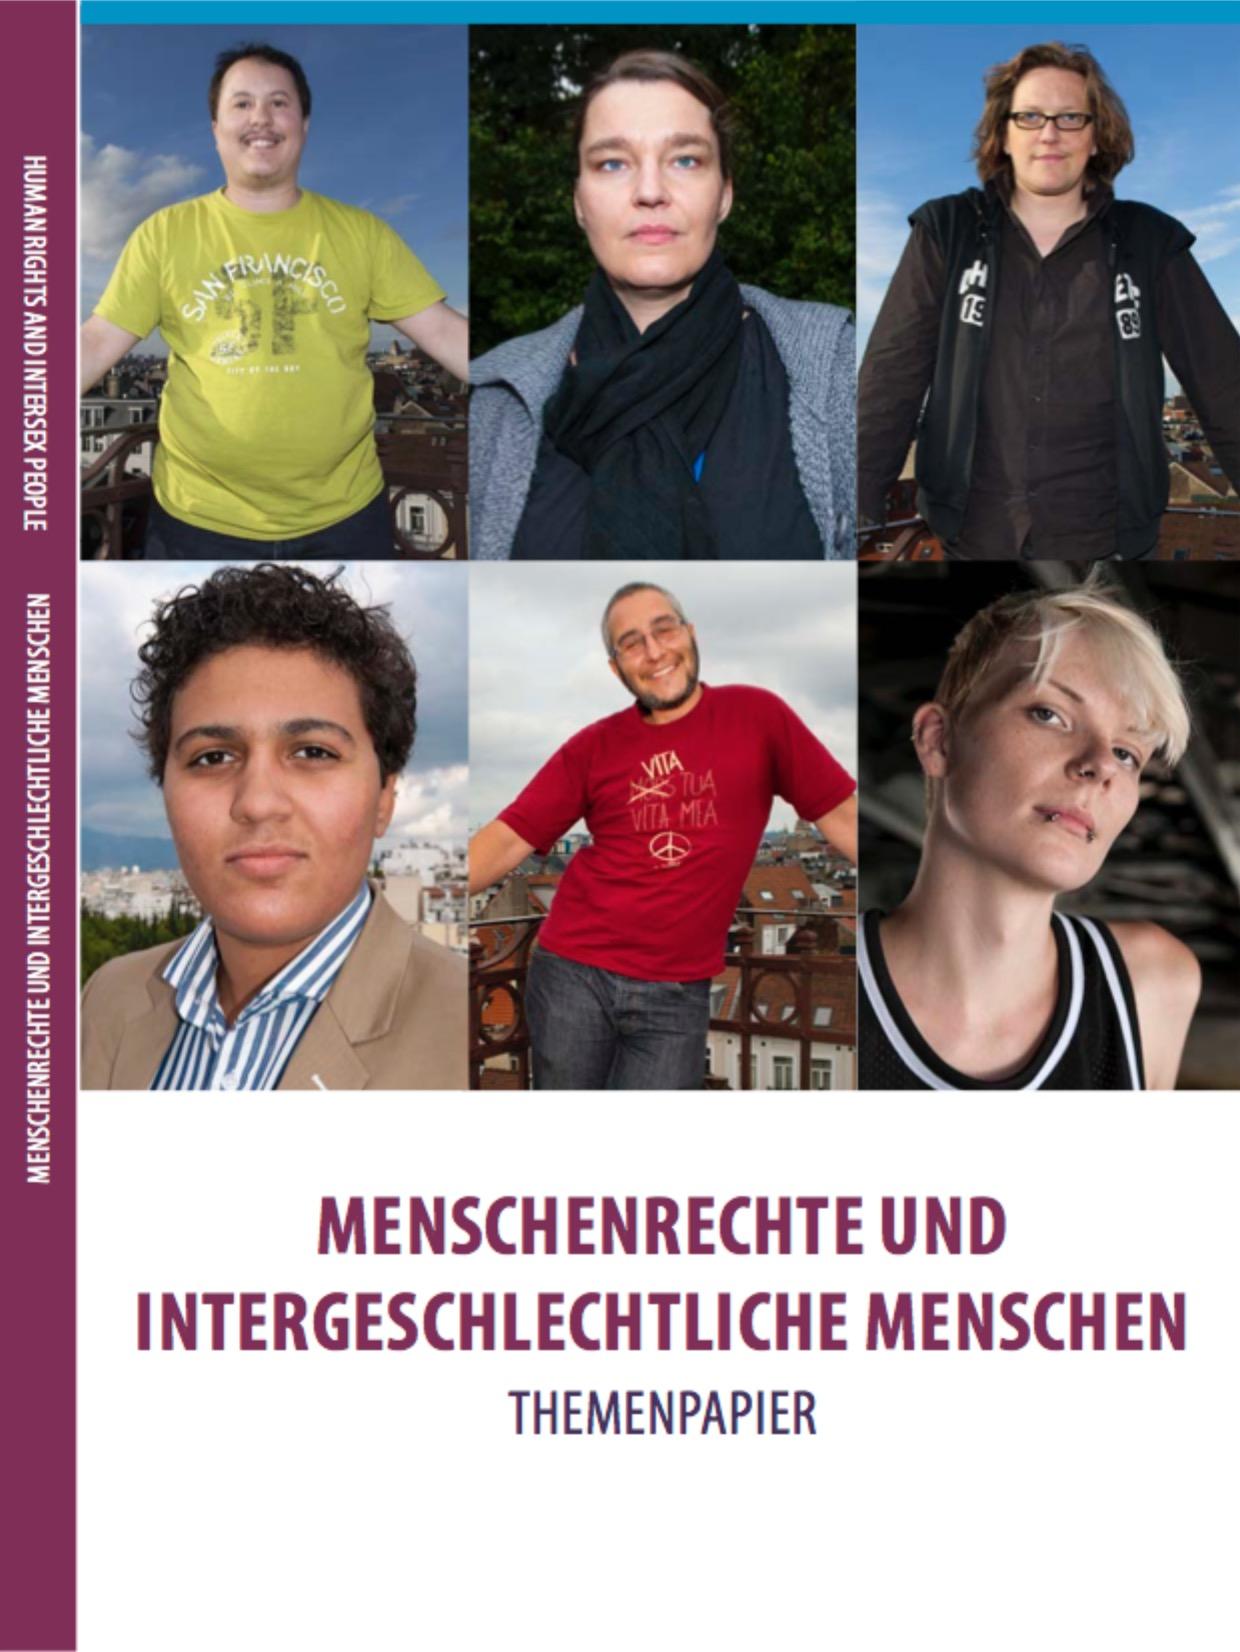 Issue Paper COHR – Themenpapier